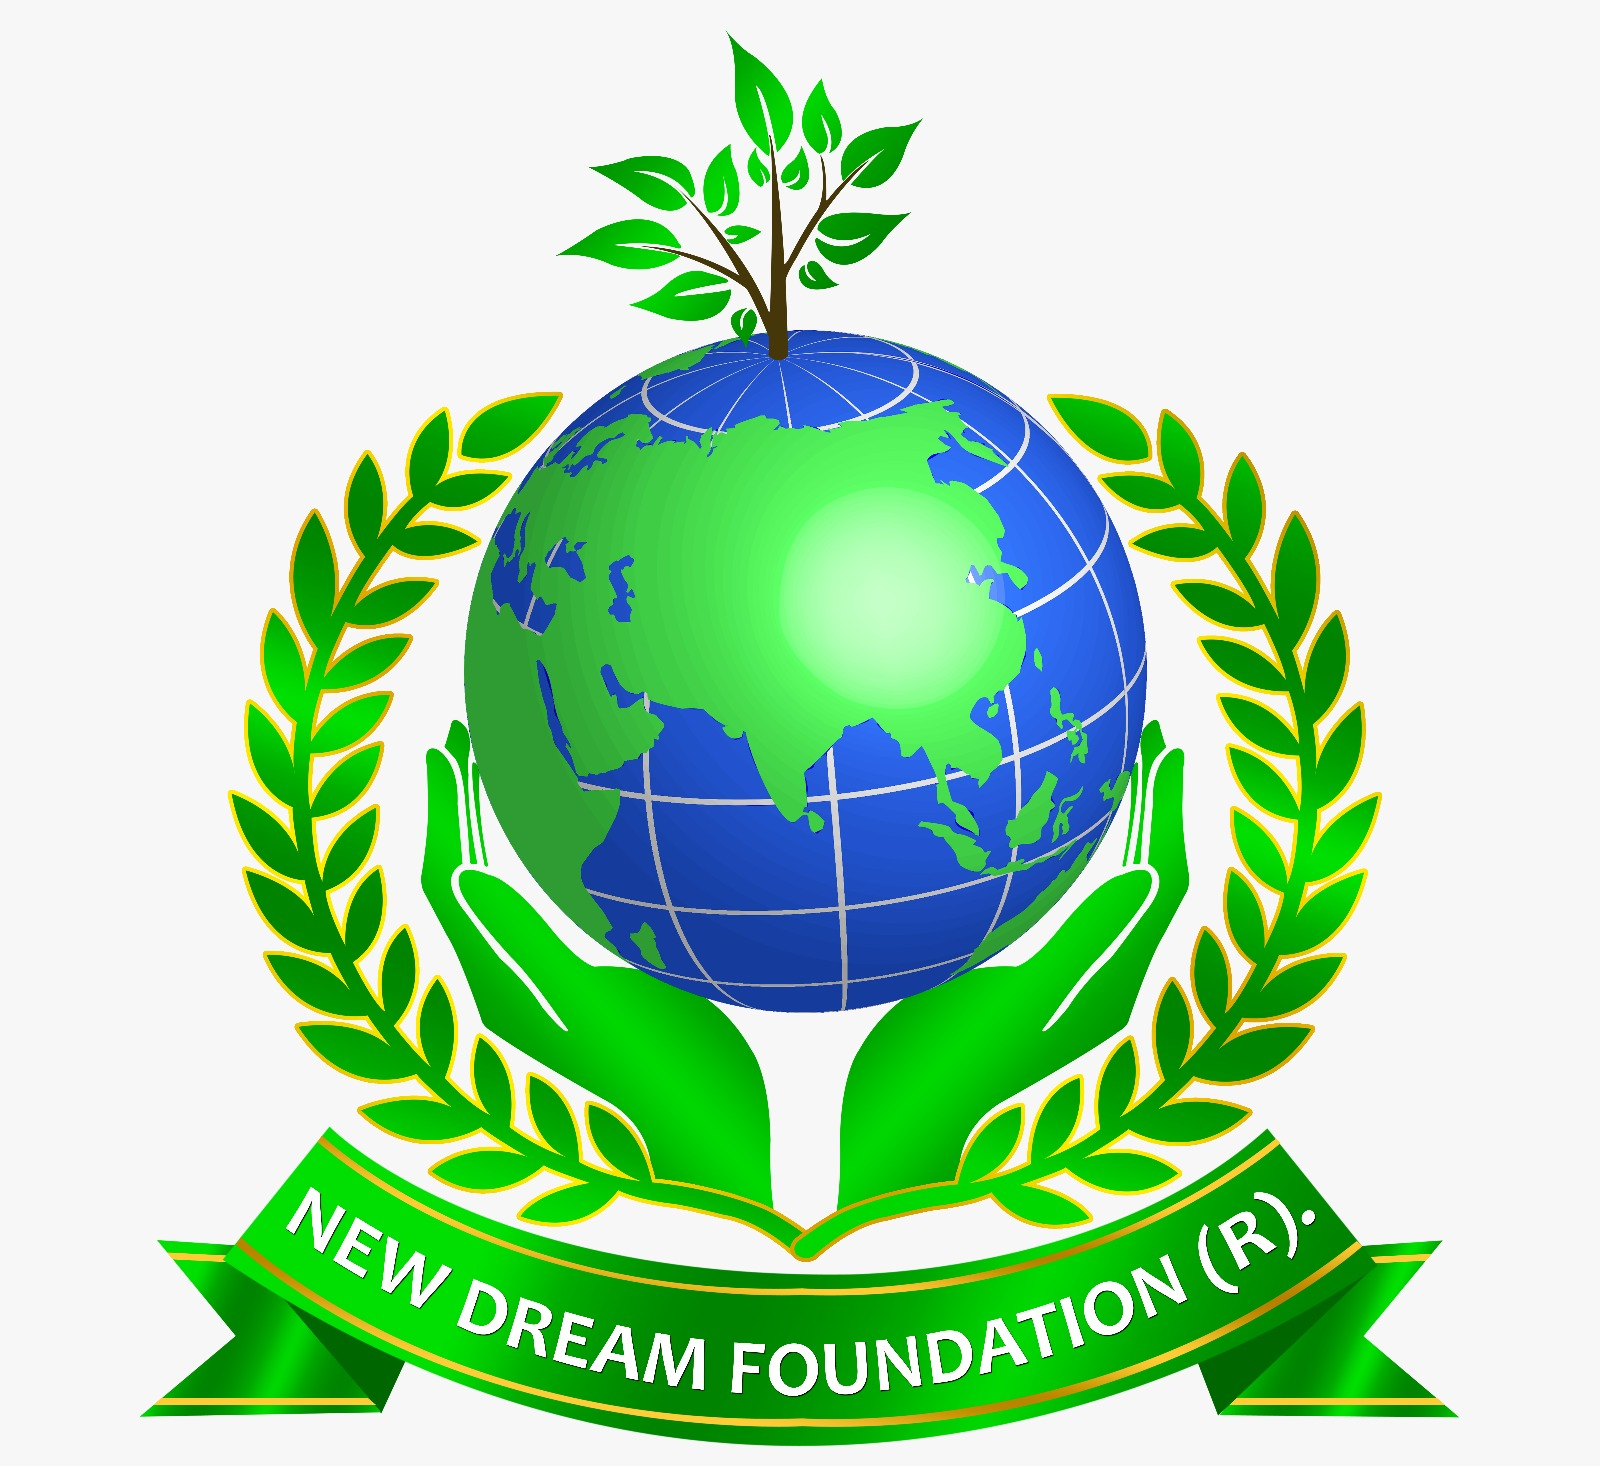 /media/newdreamfoundation/logo.jpg